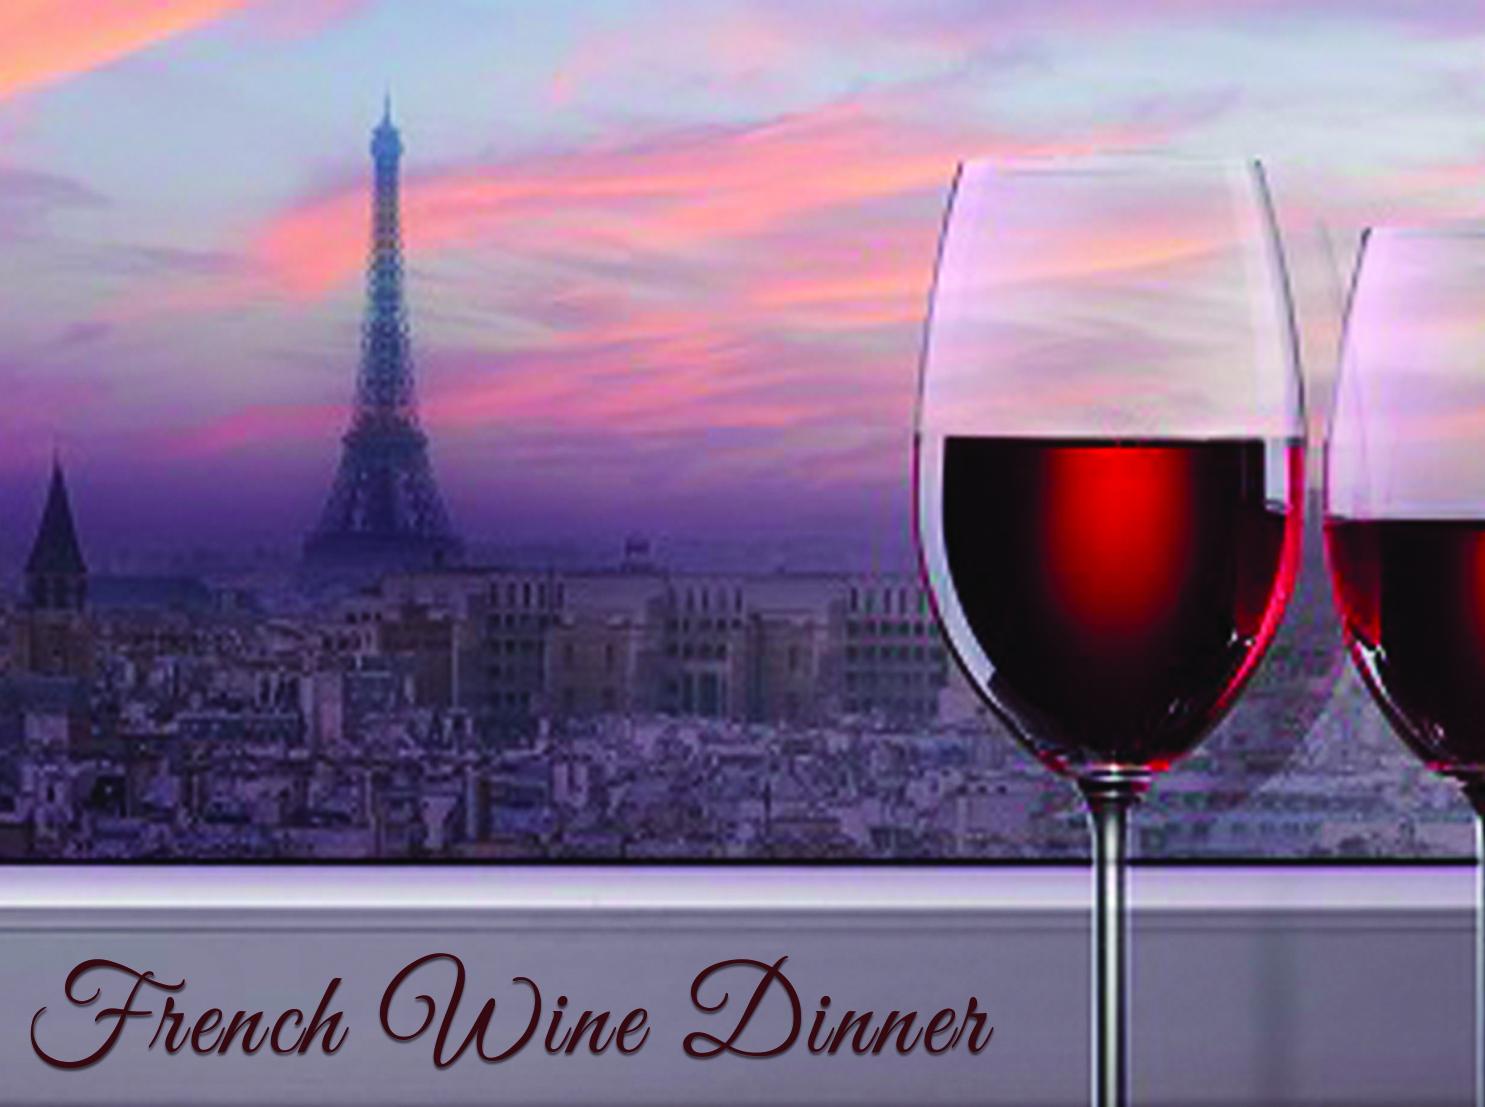 01.09.19_WS- FRENCH WINE DINNER-2.jpg